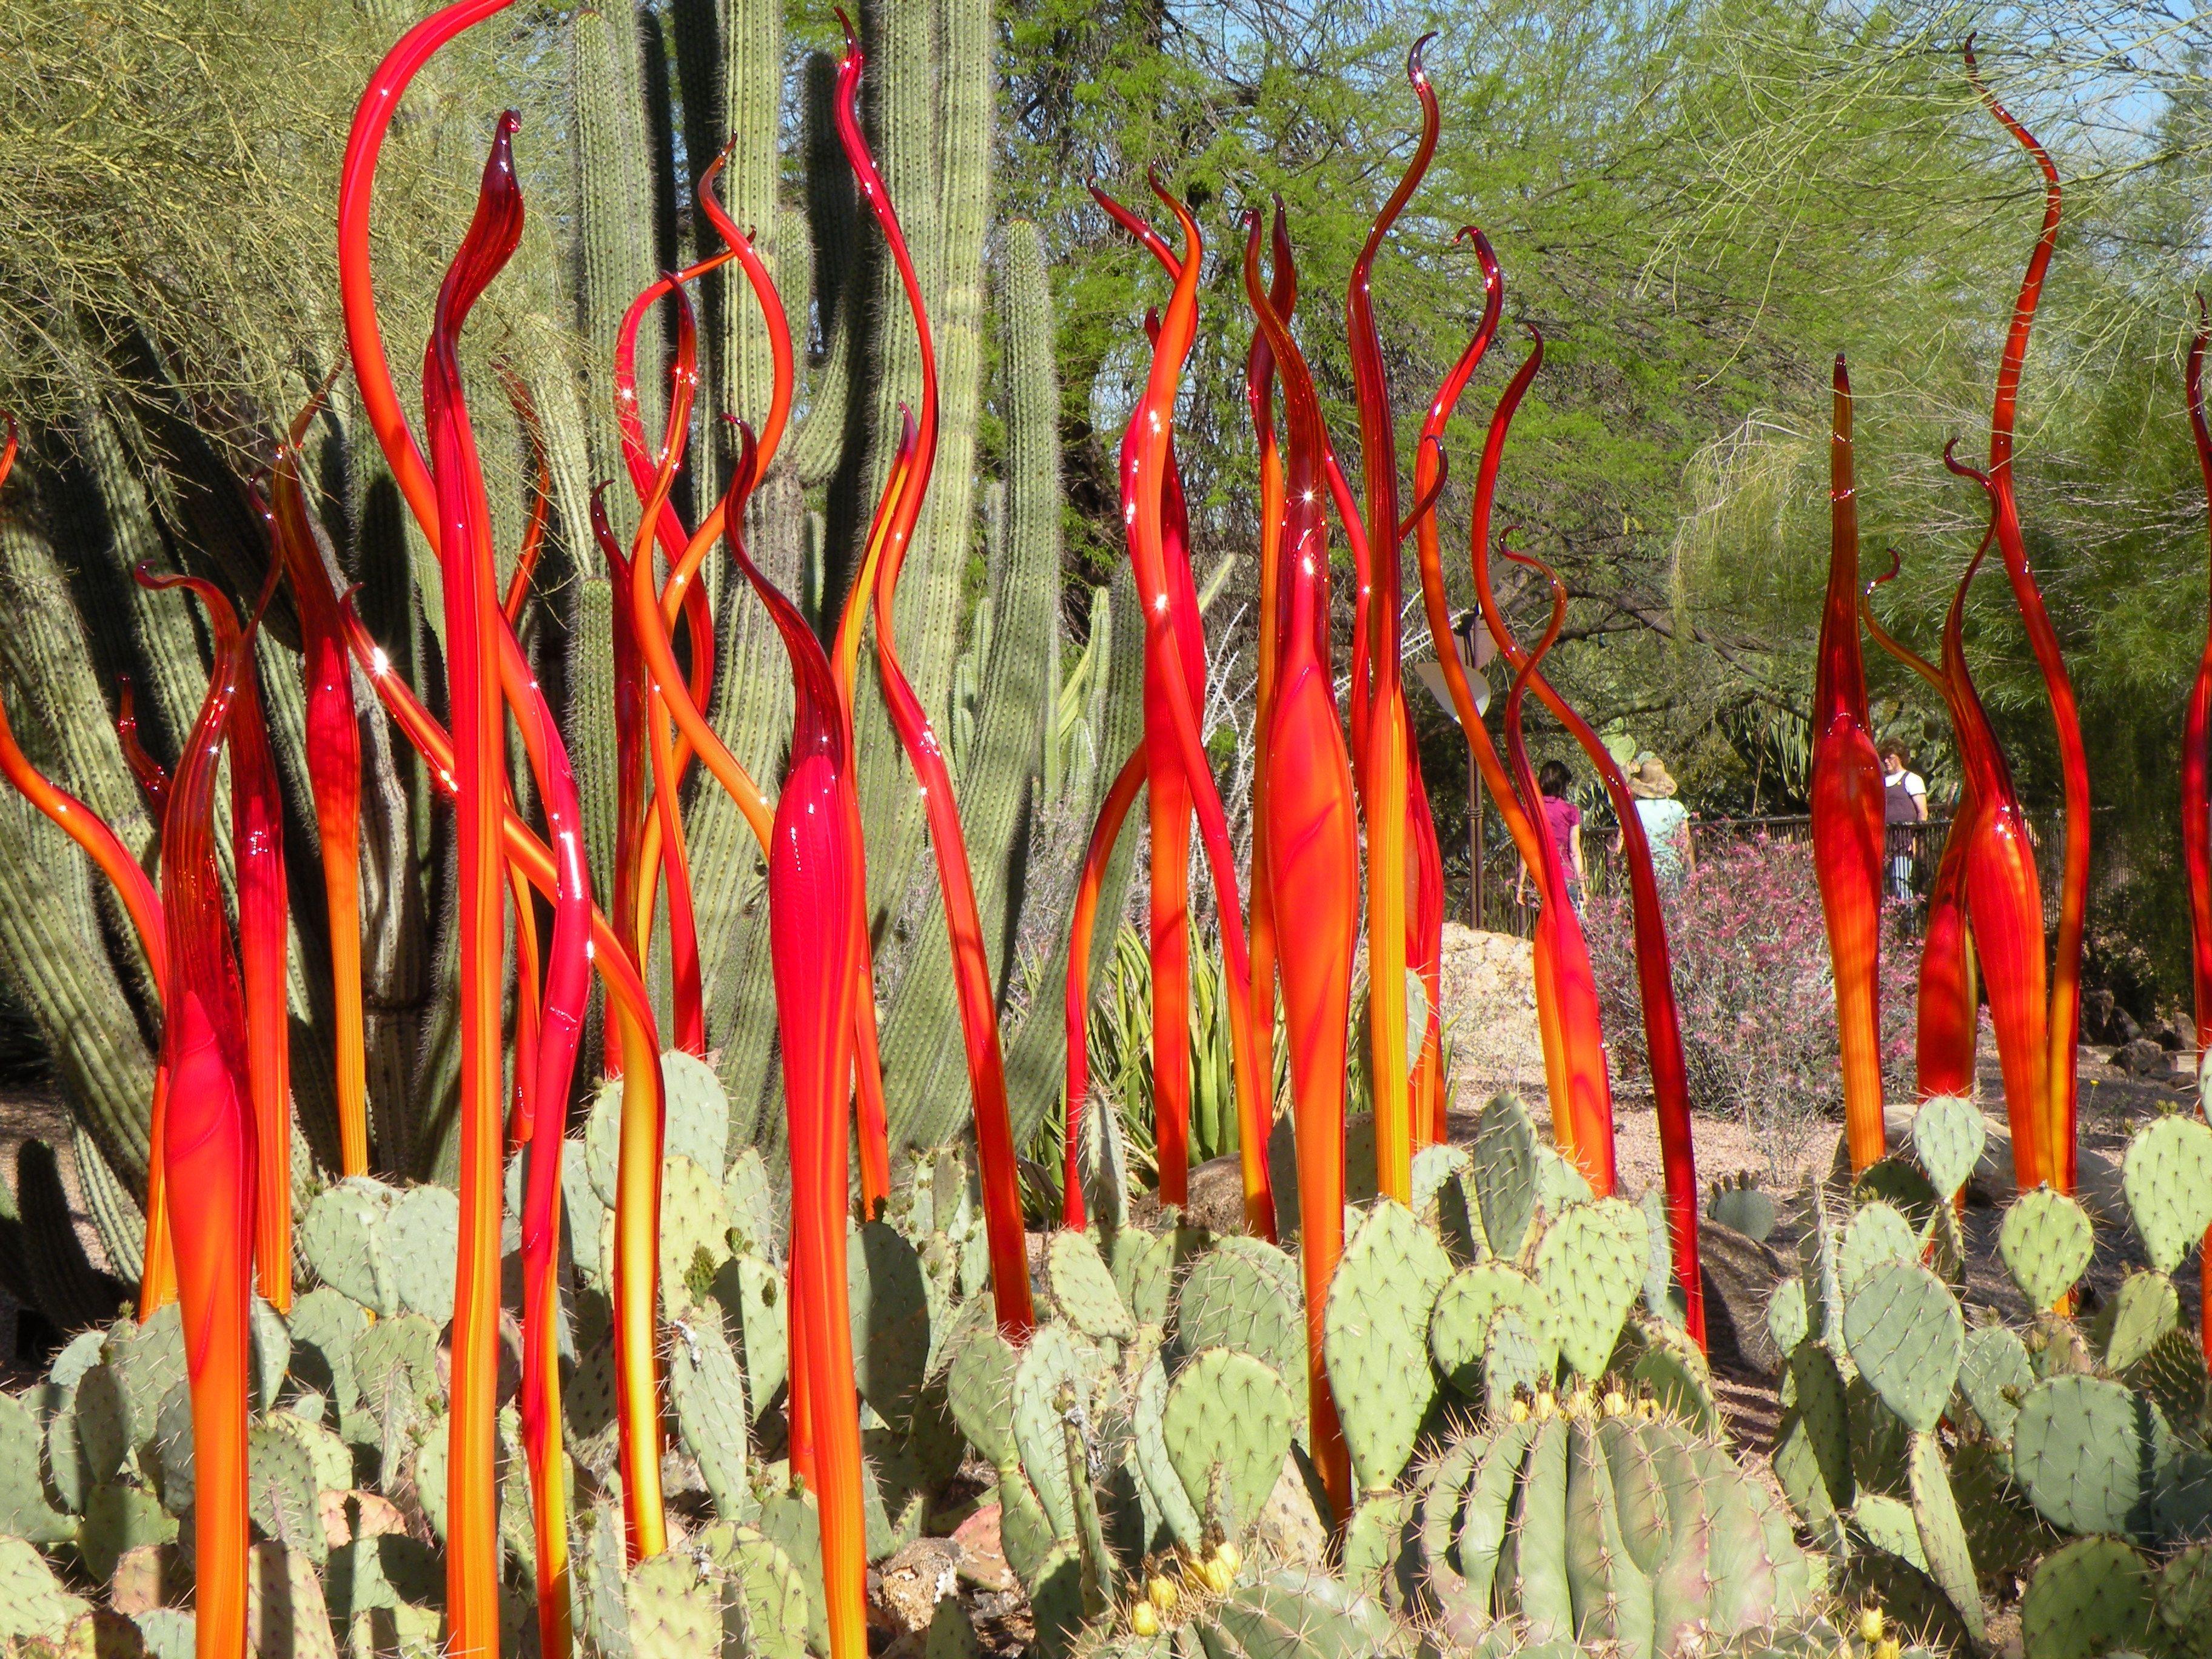 Fire- Chihuly, Phoenix Botanical Gardens